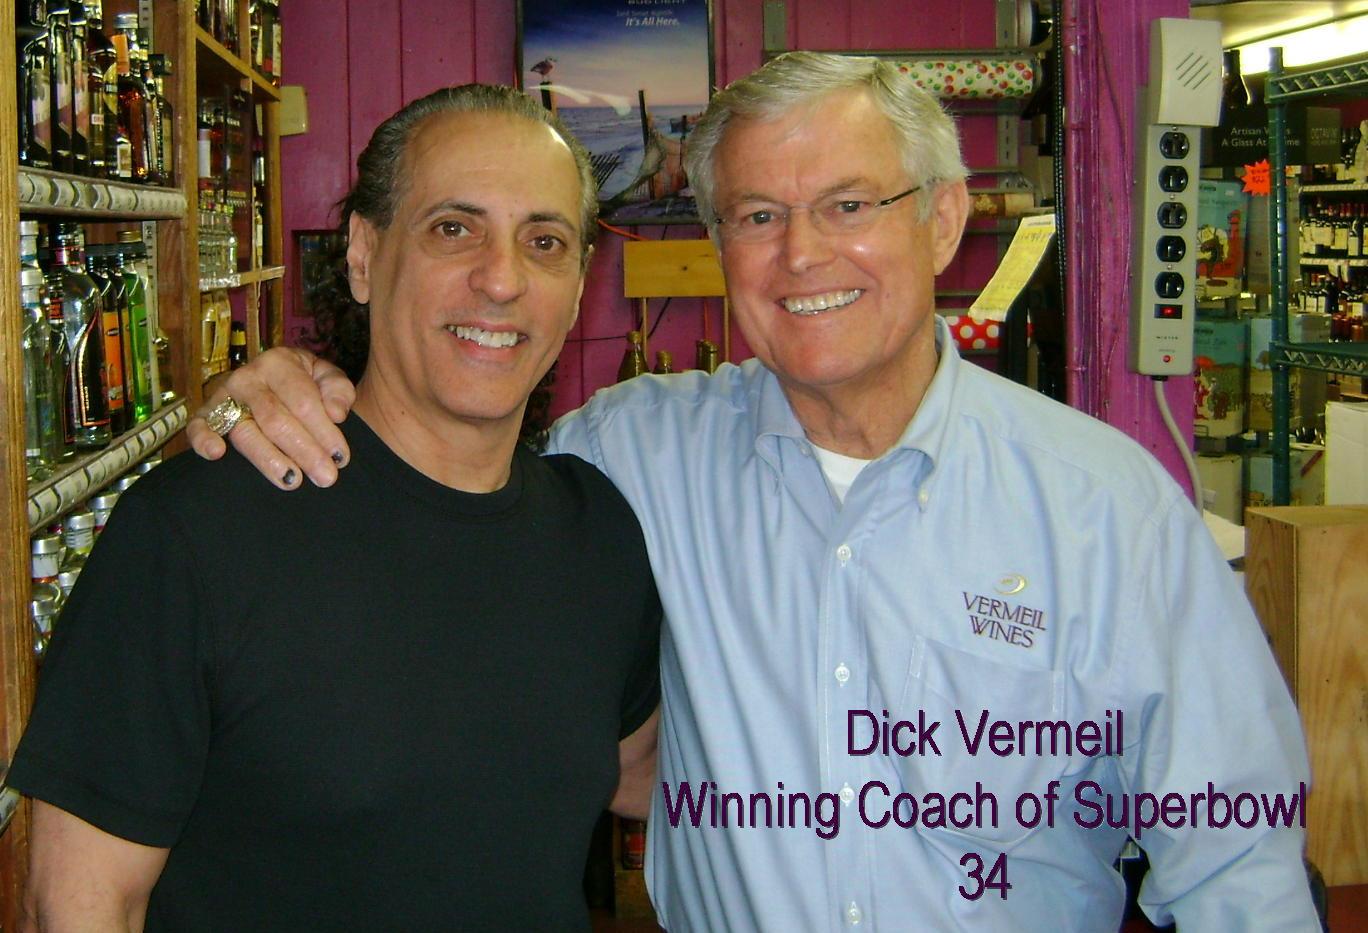 Dick Vermiel